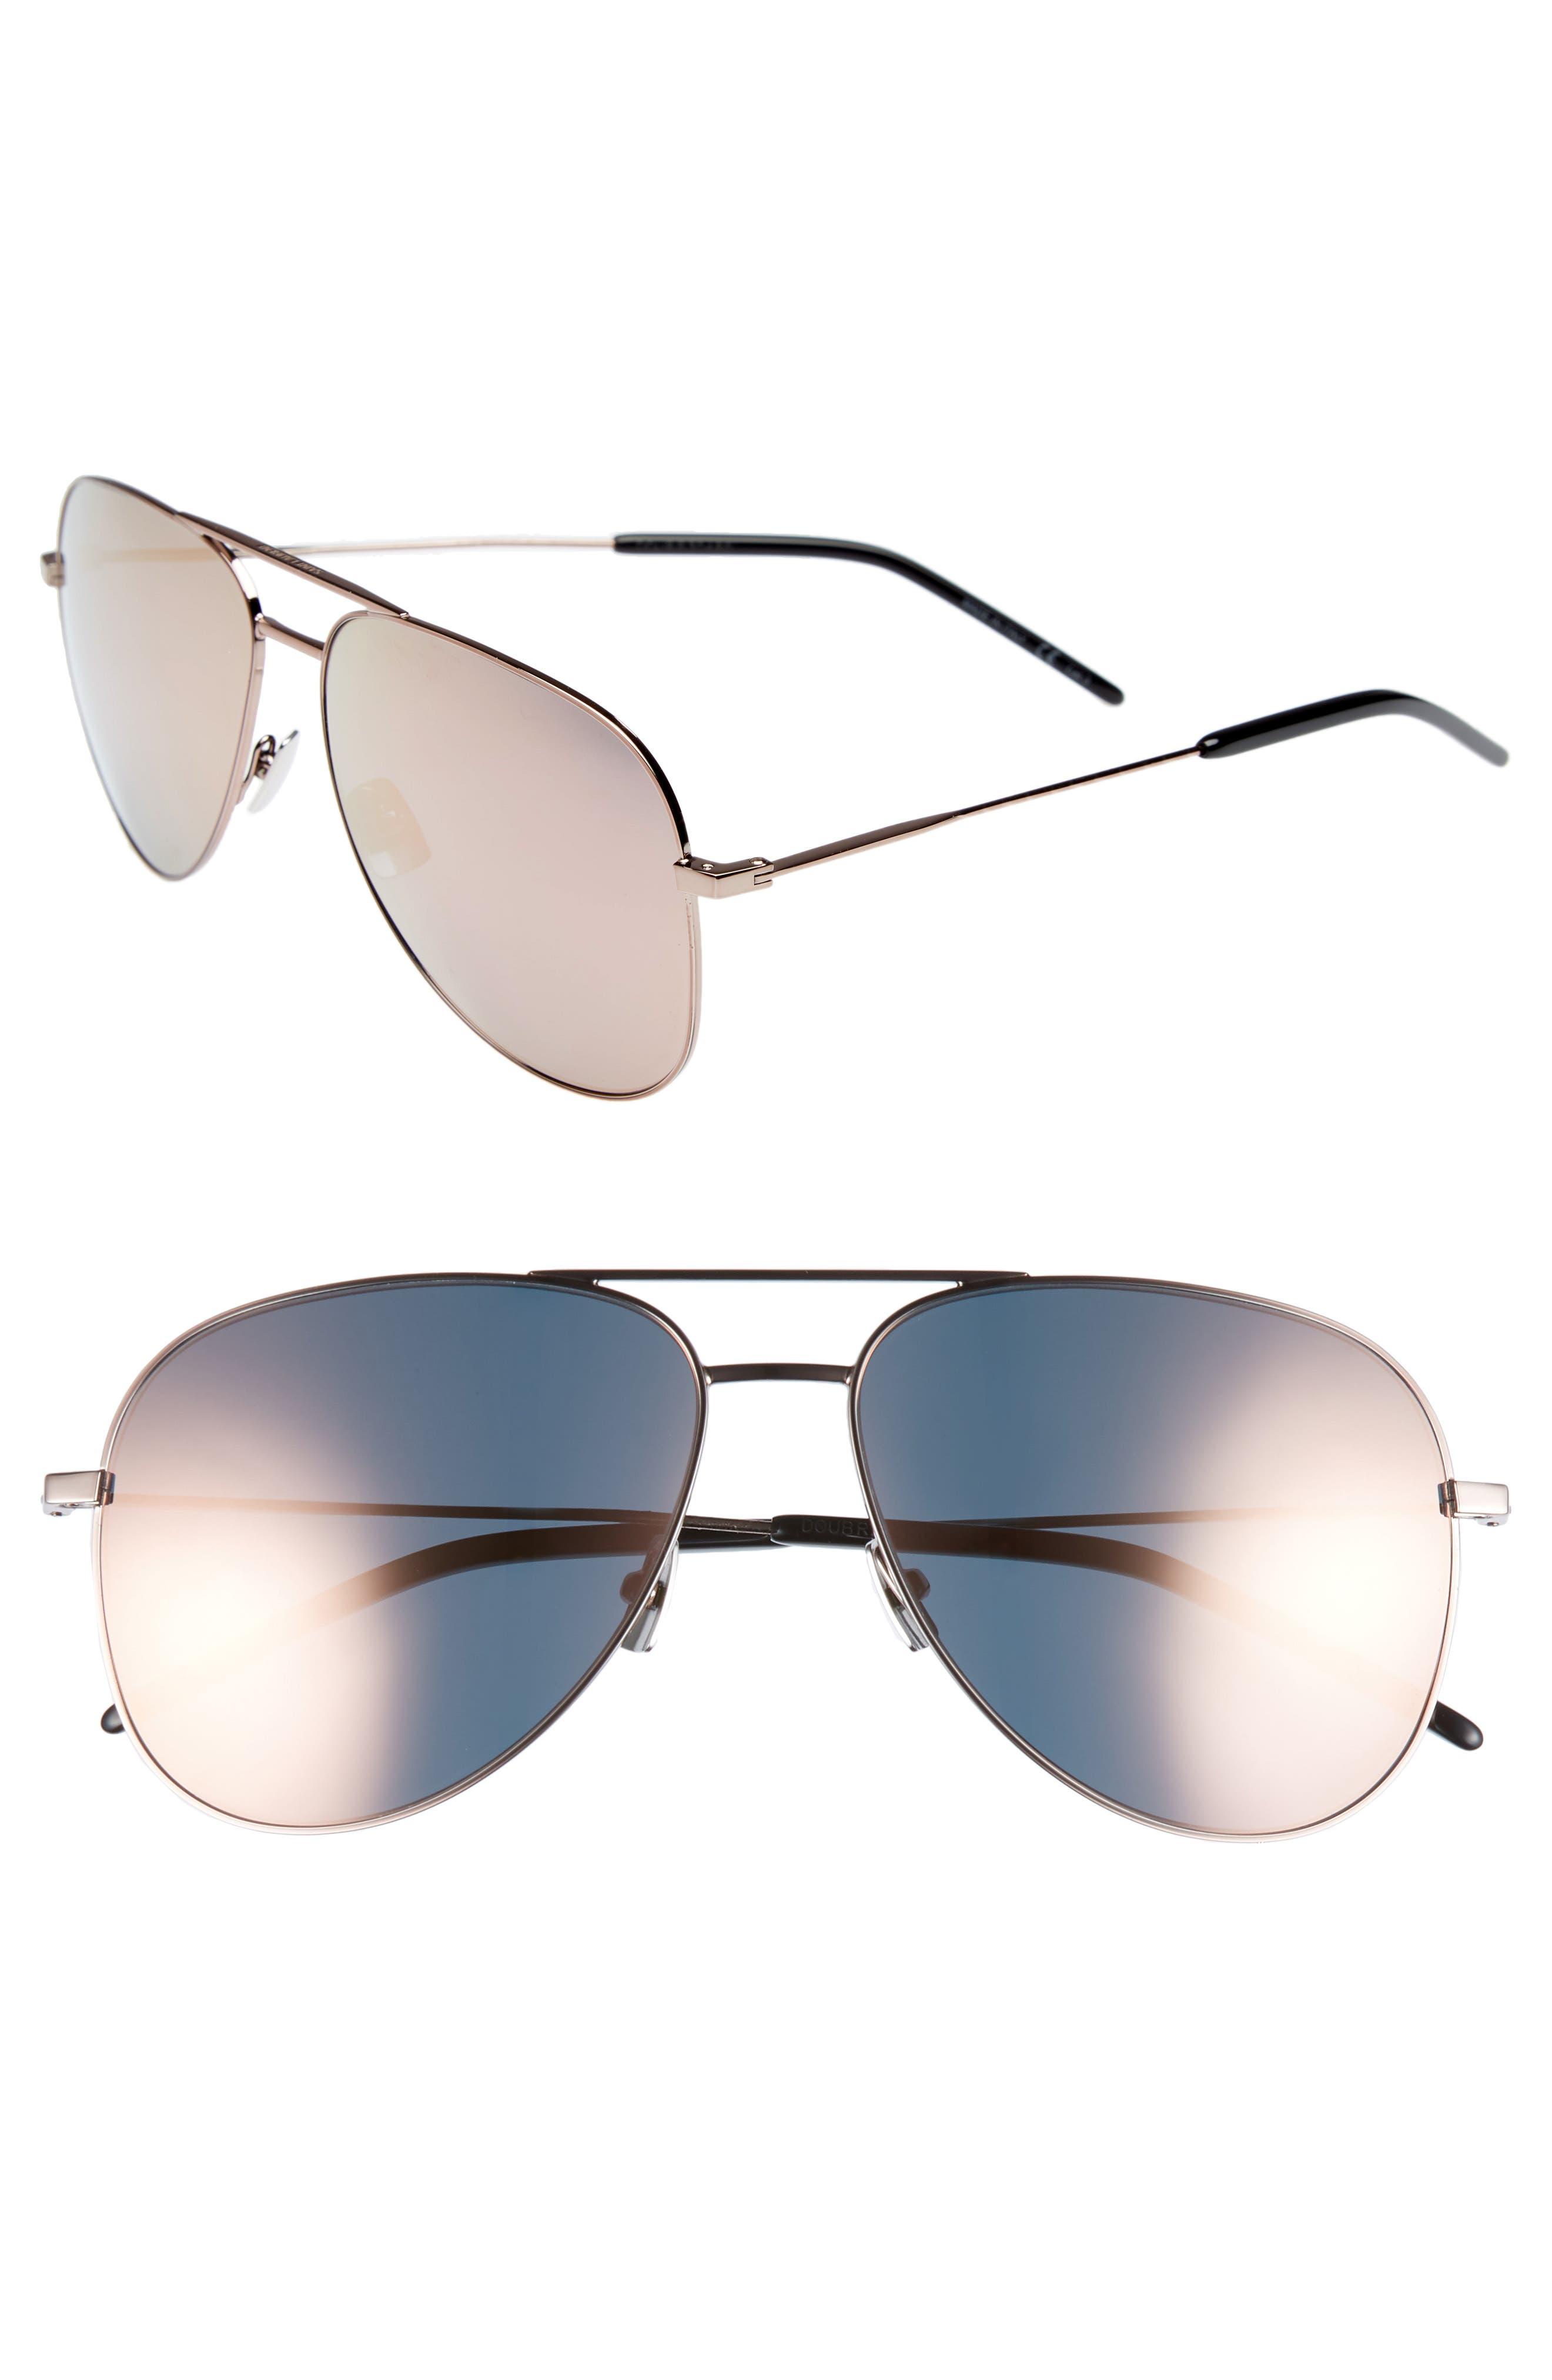 59mm Brow Bar Aviator Sunglasses,                             Main thumbnail 1, color,                             250